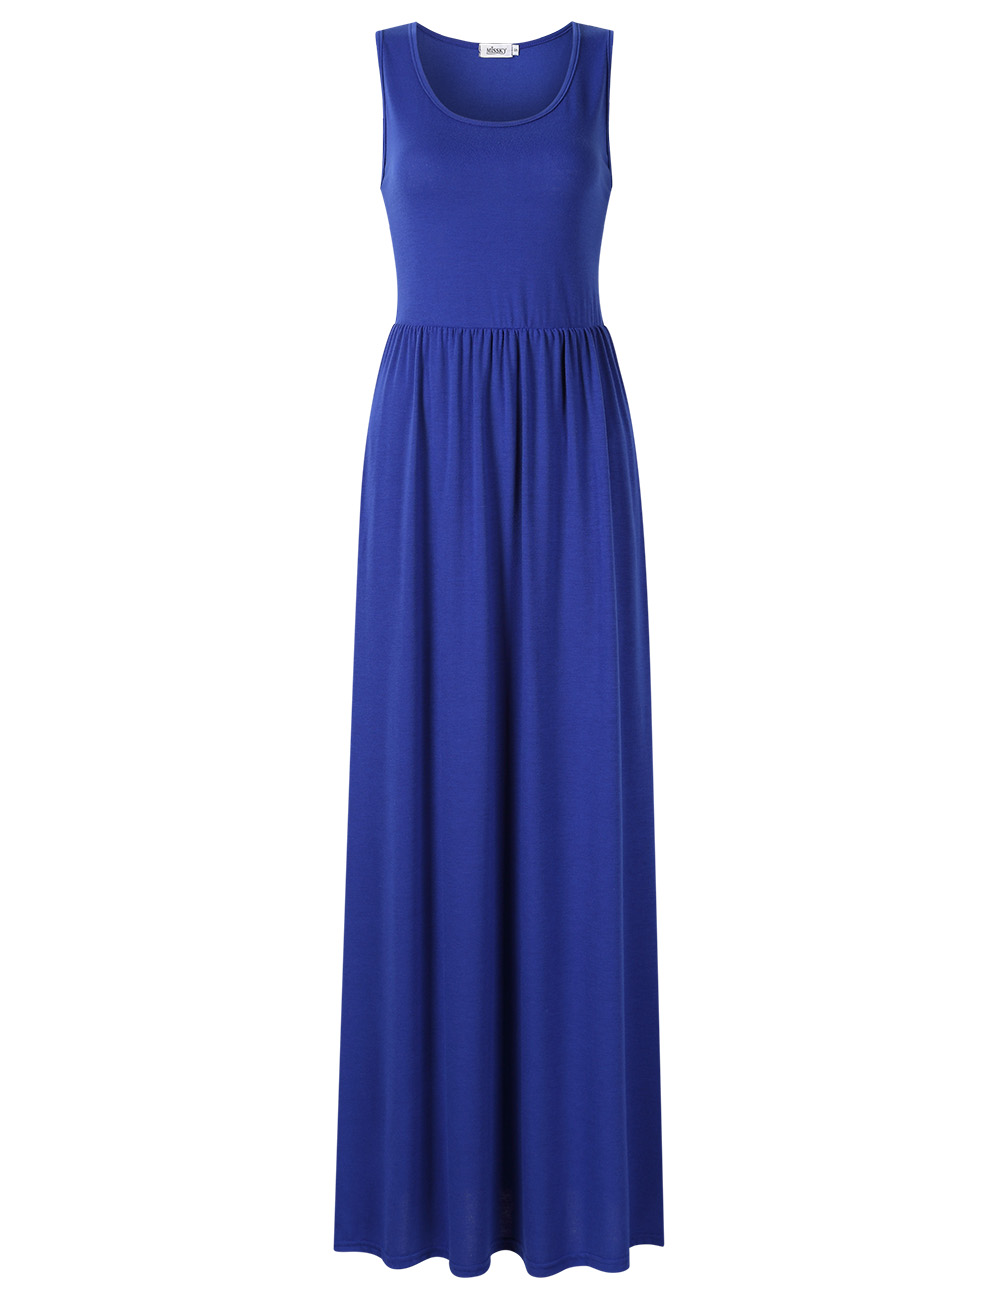 [US Direct] Ladies vest pleated pocket long skirt blue 1_M missky